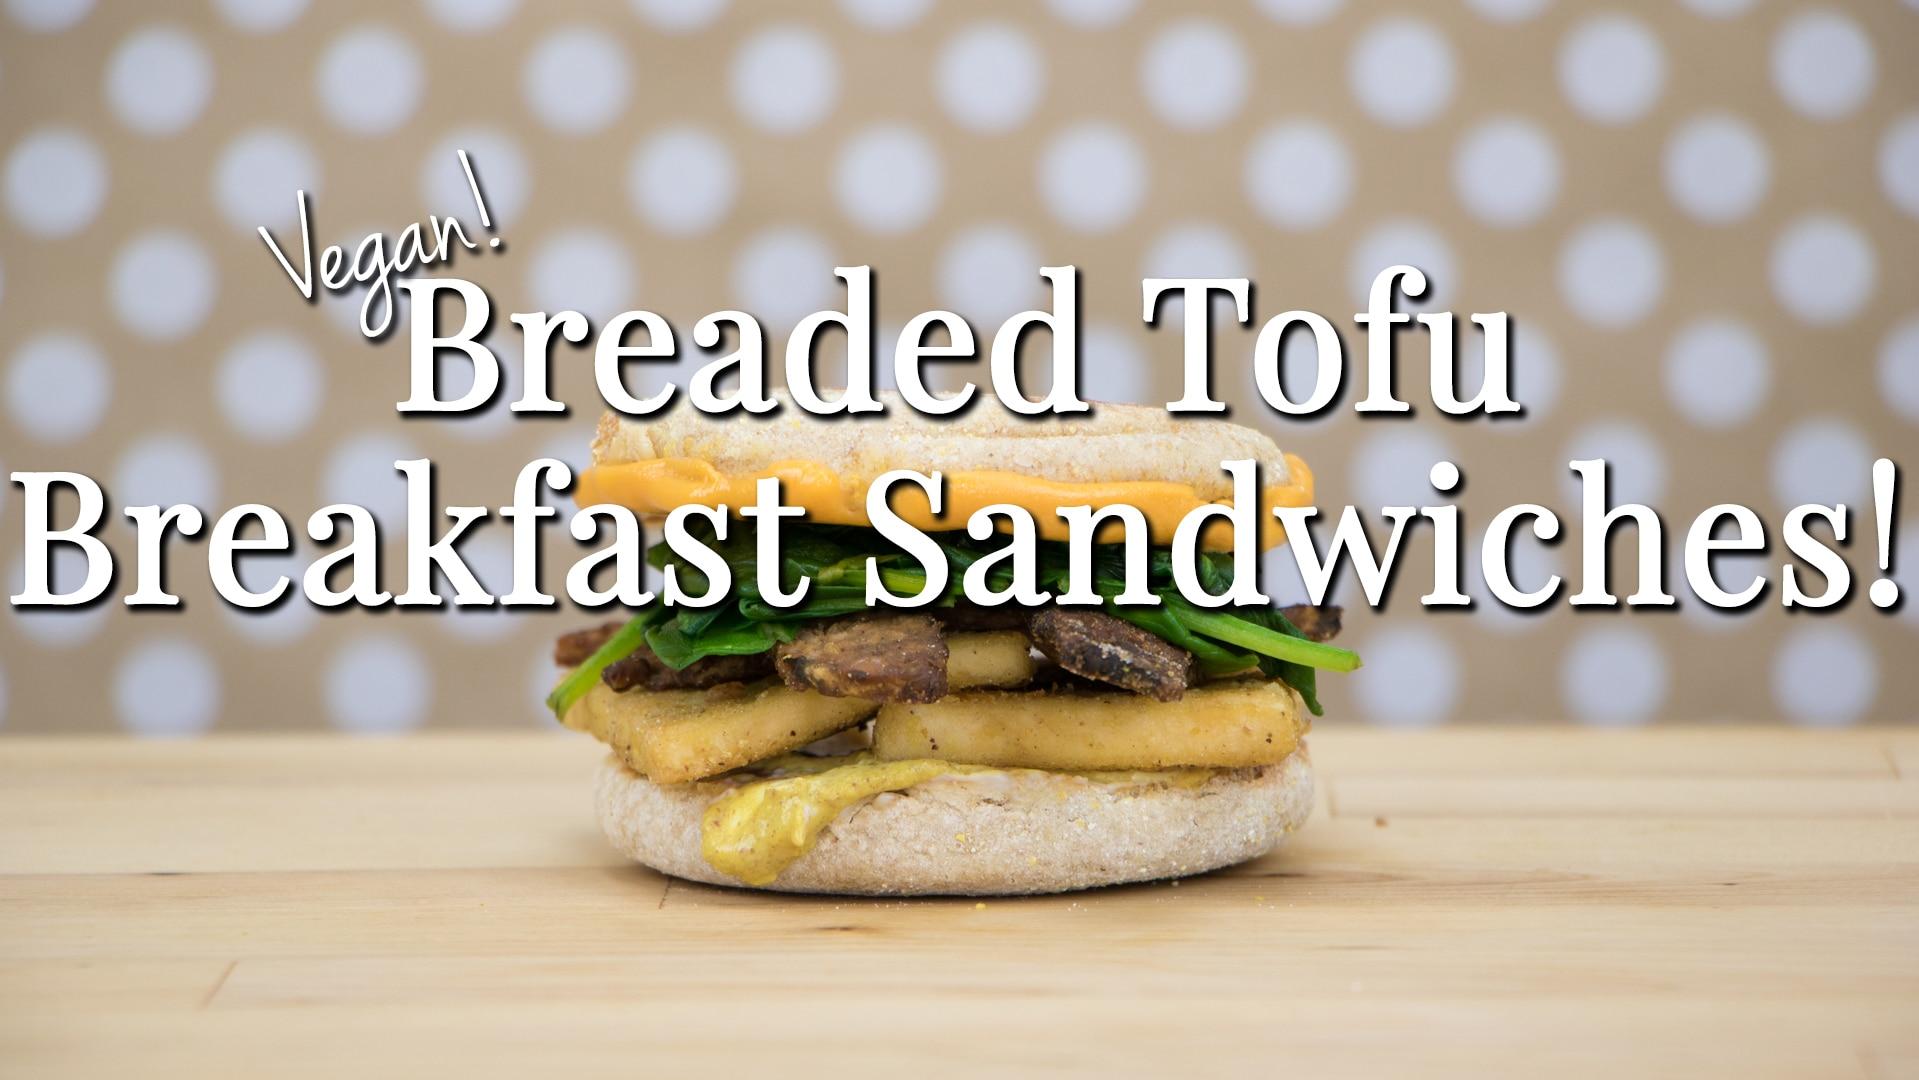 How to Make Vegan Breaded Tofu Breakfast Sandwiches